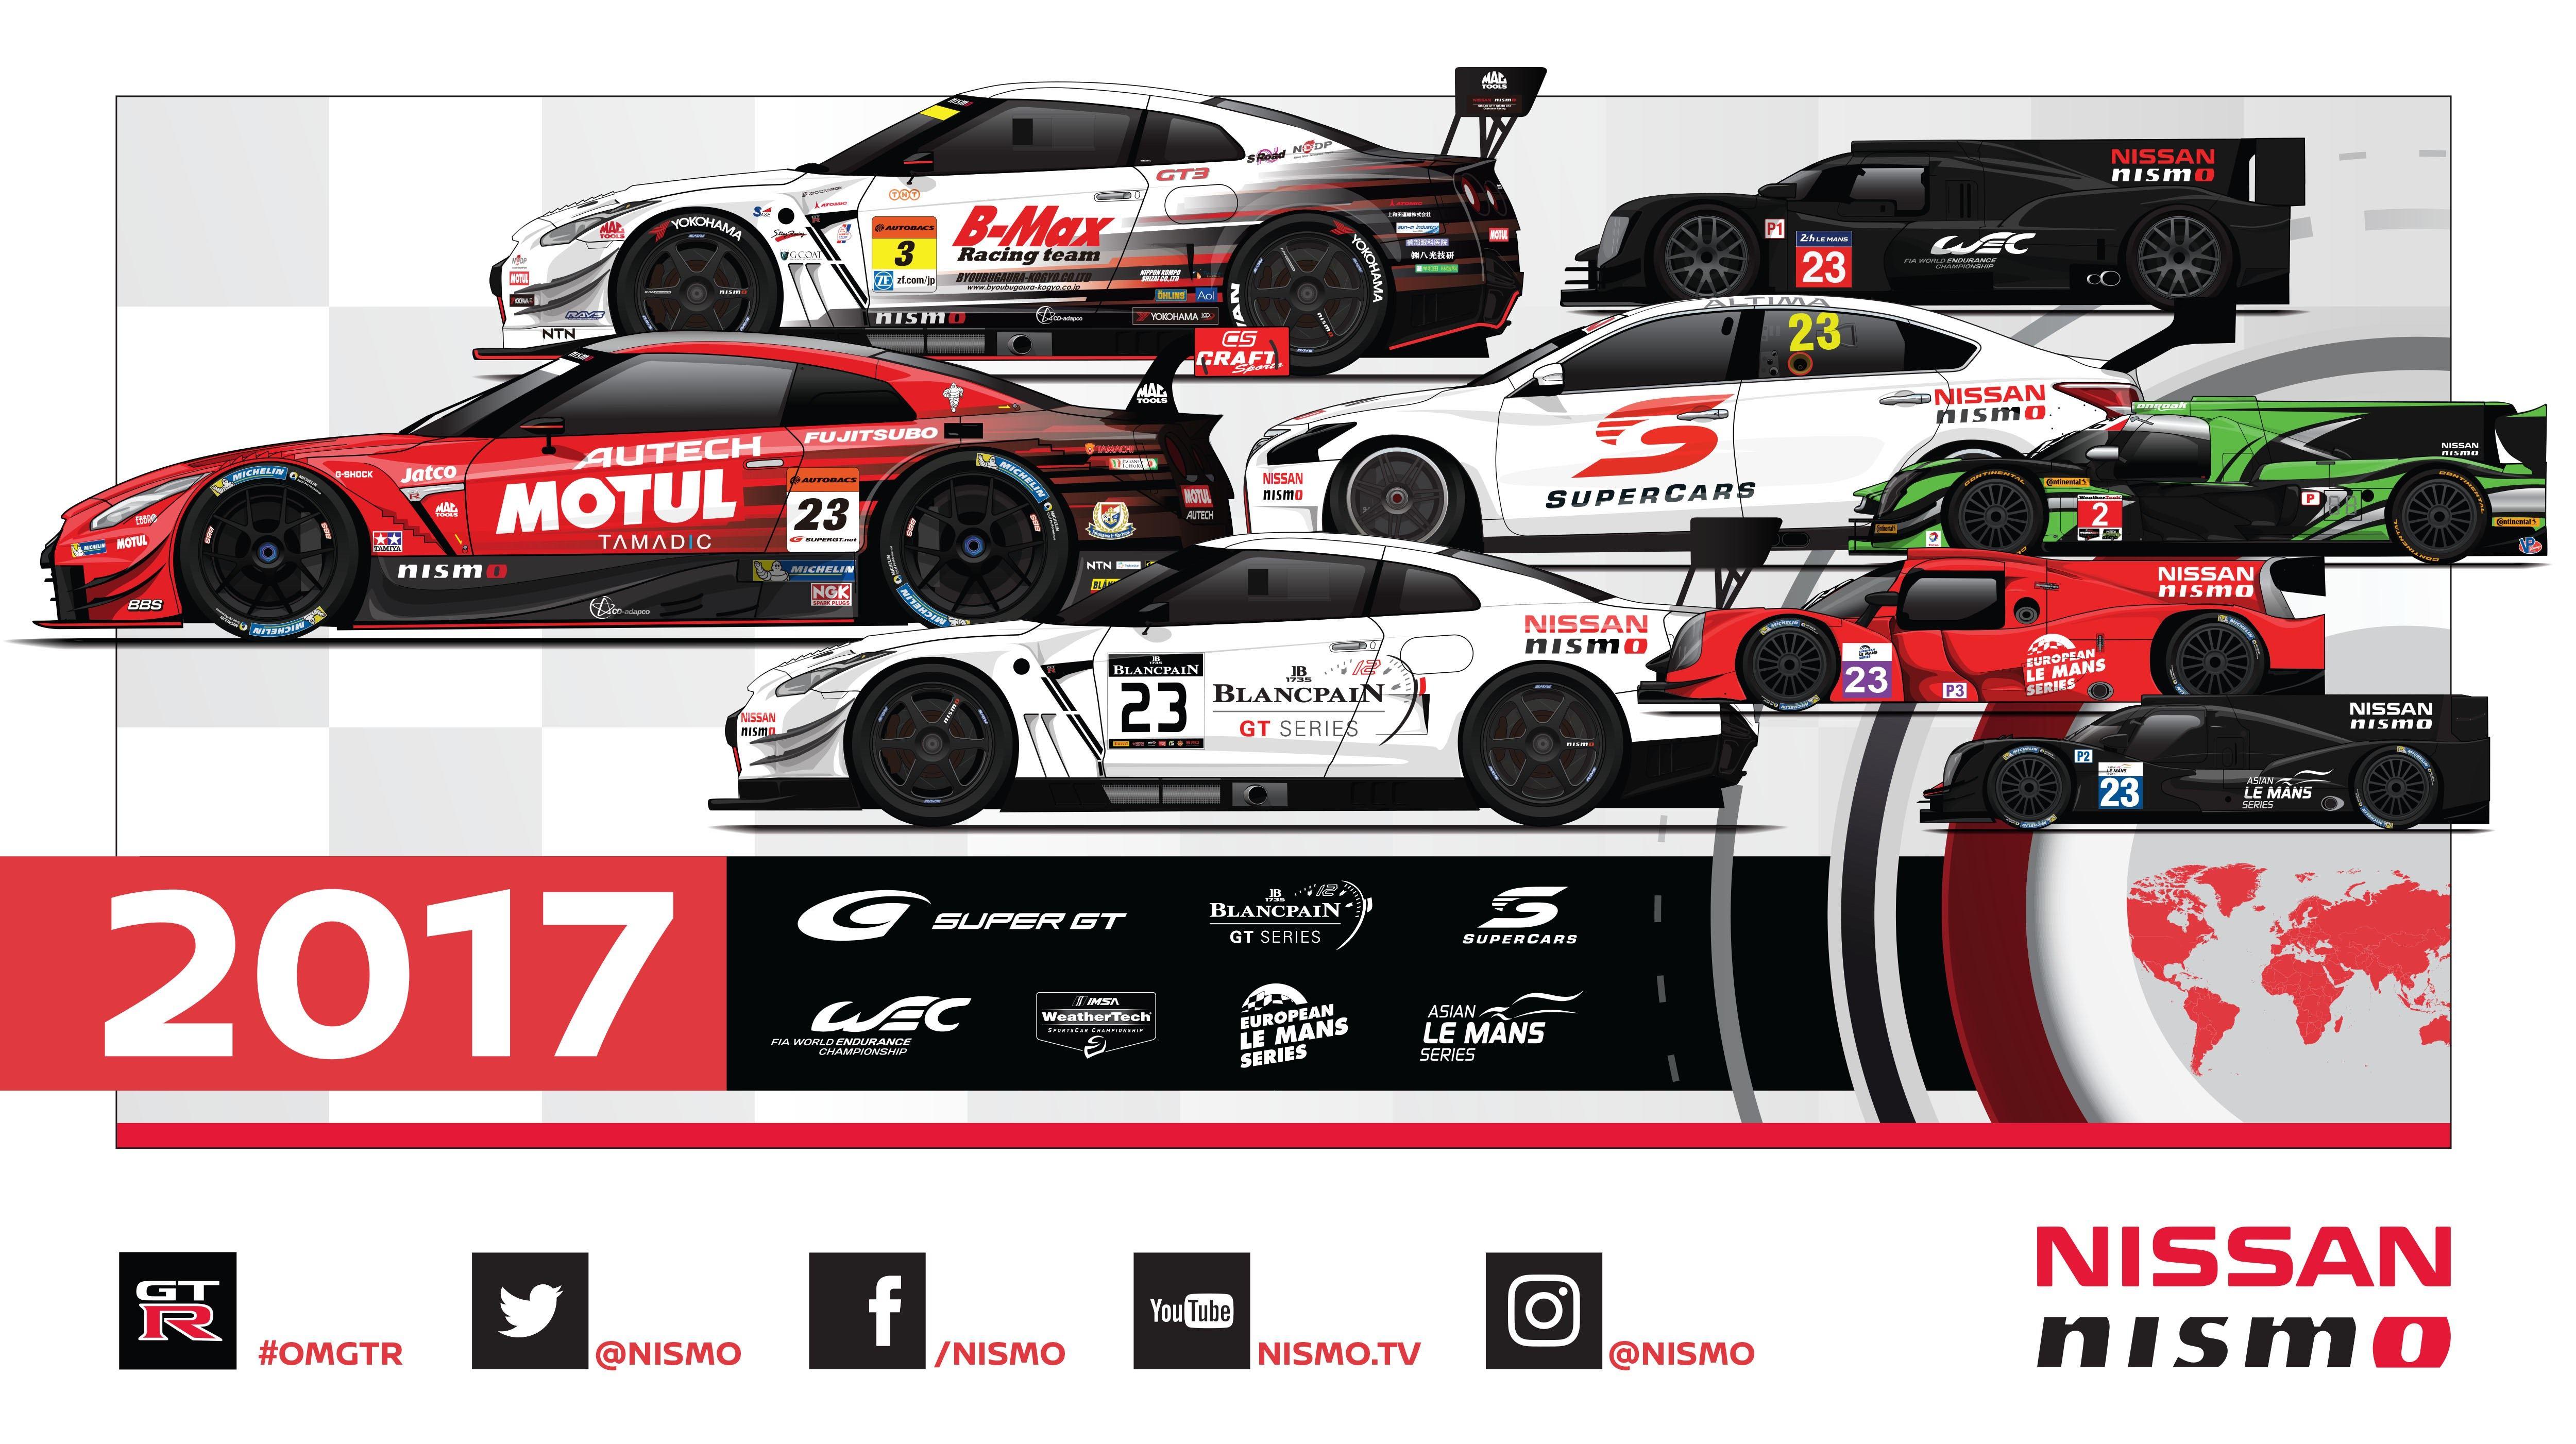 Nissan Nismo Motorsportprogramm 2017